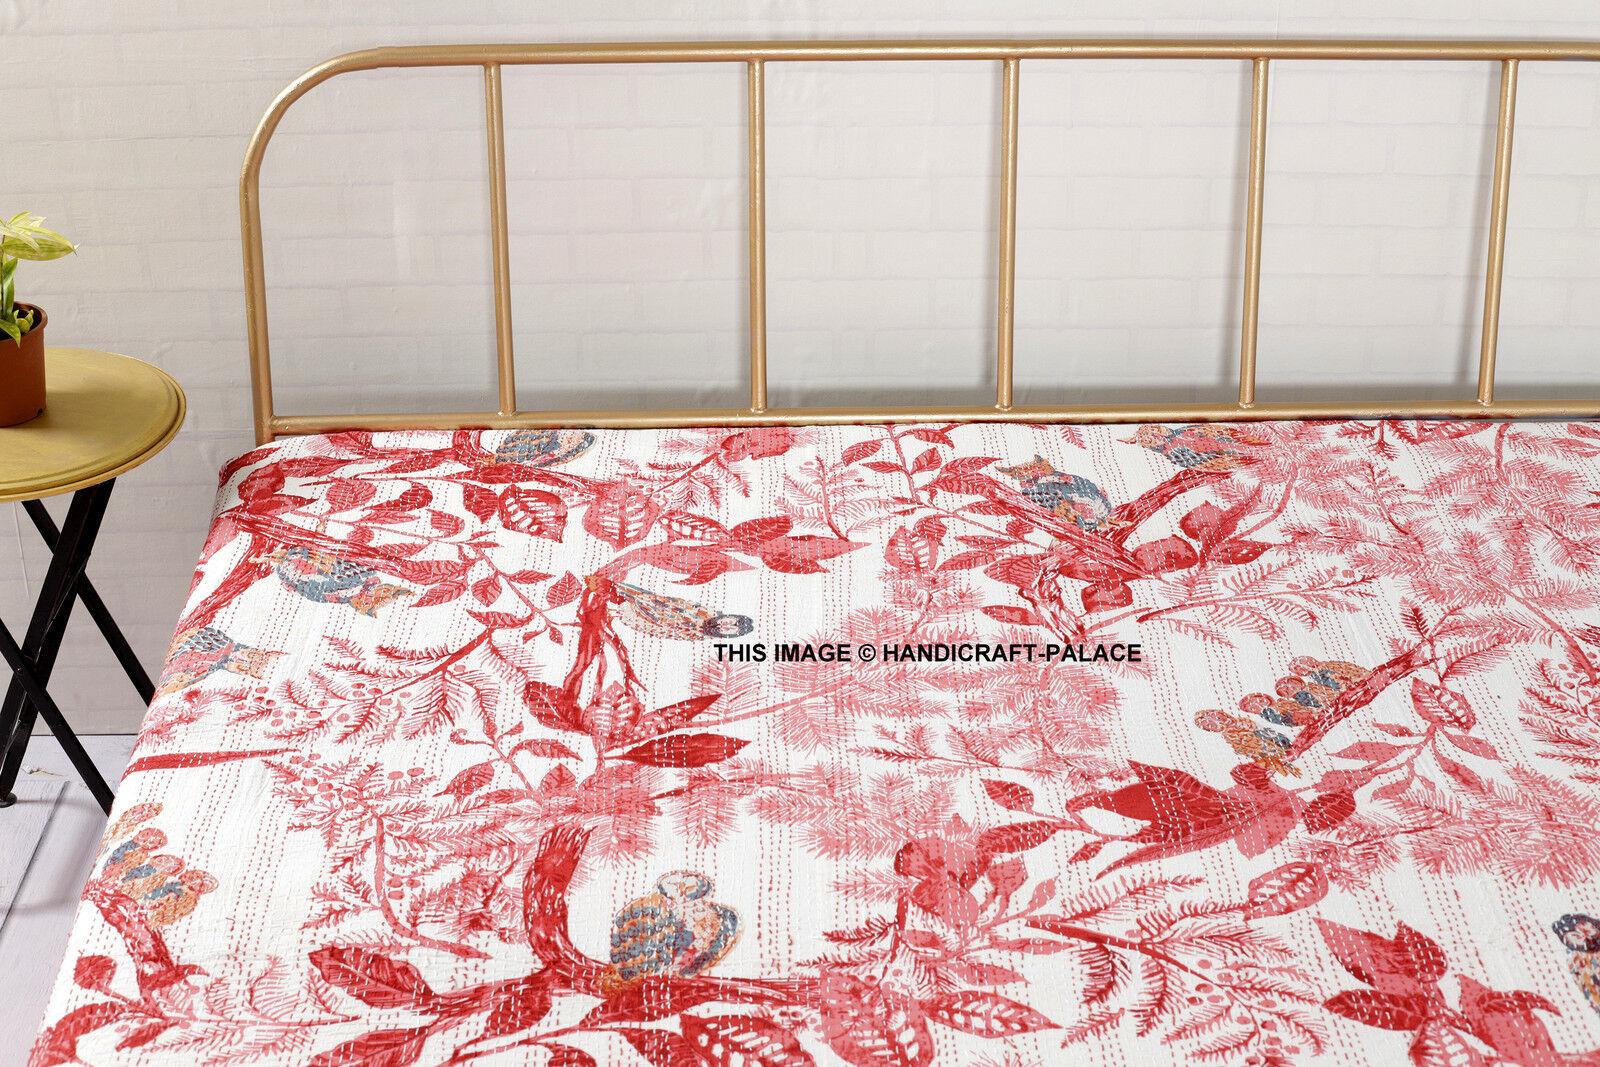 Indian Vintage Owl Bird Print Handmade Kantha Quilt Bedspread Queen Queen Queen Throw Decor 9dc778